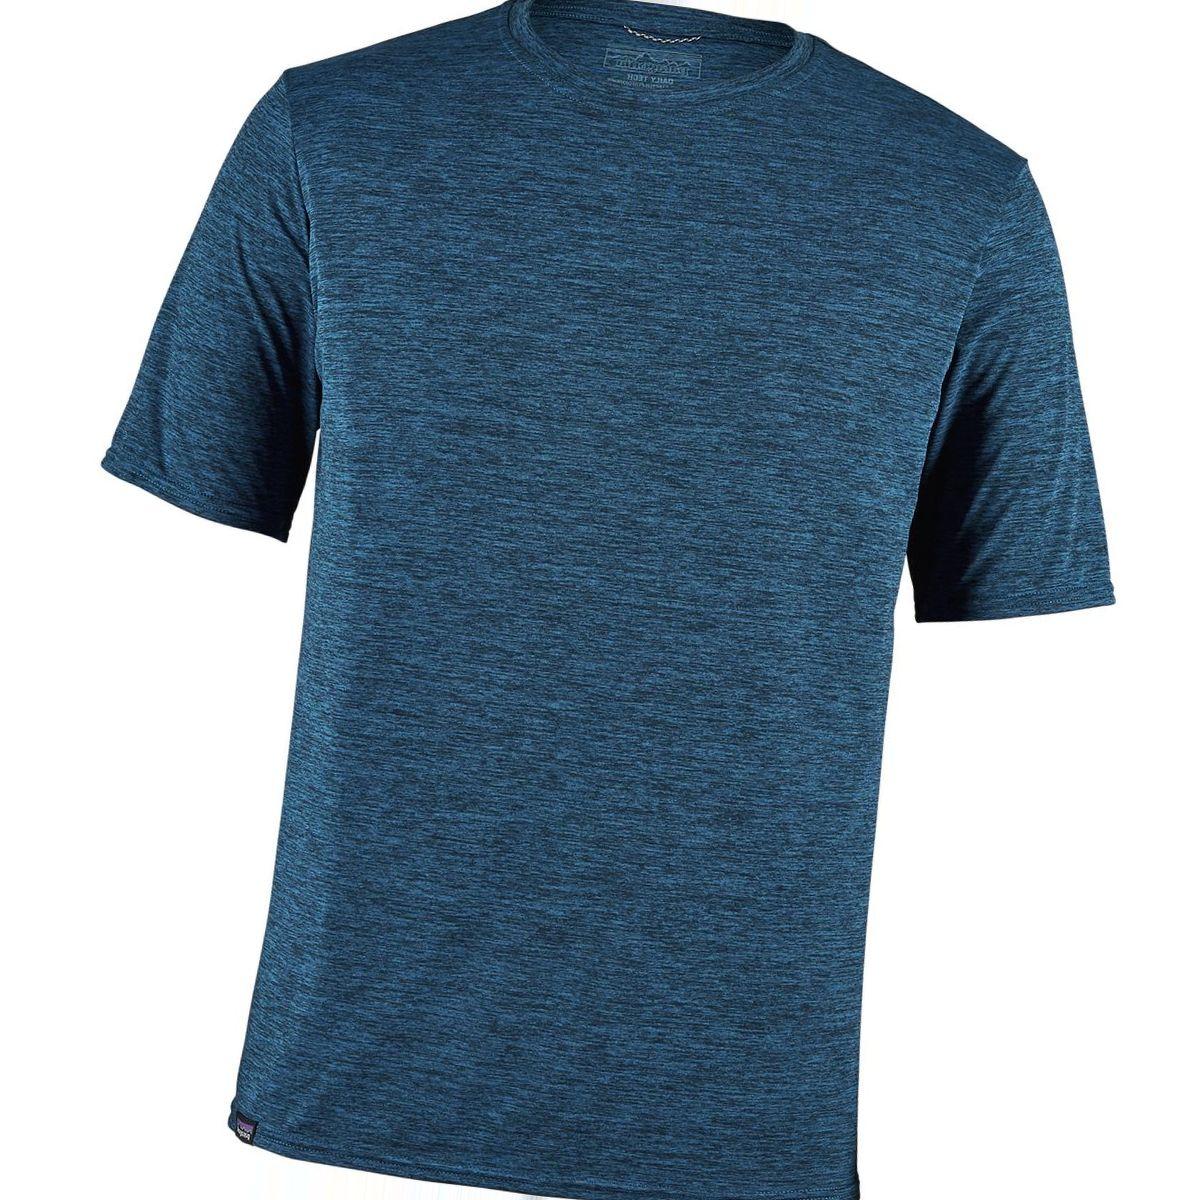 Patagonia Capilene Cool Daily Short-Sleeve Shirt - Men's